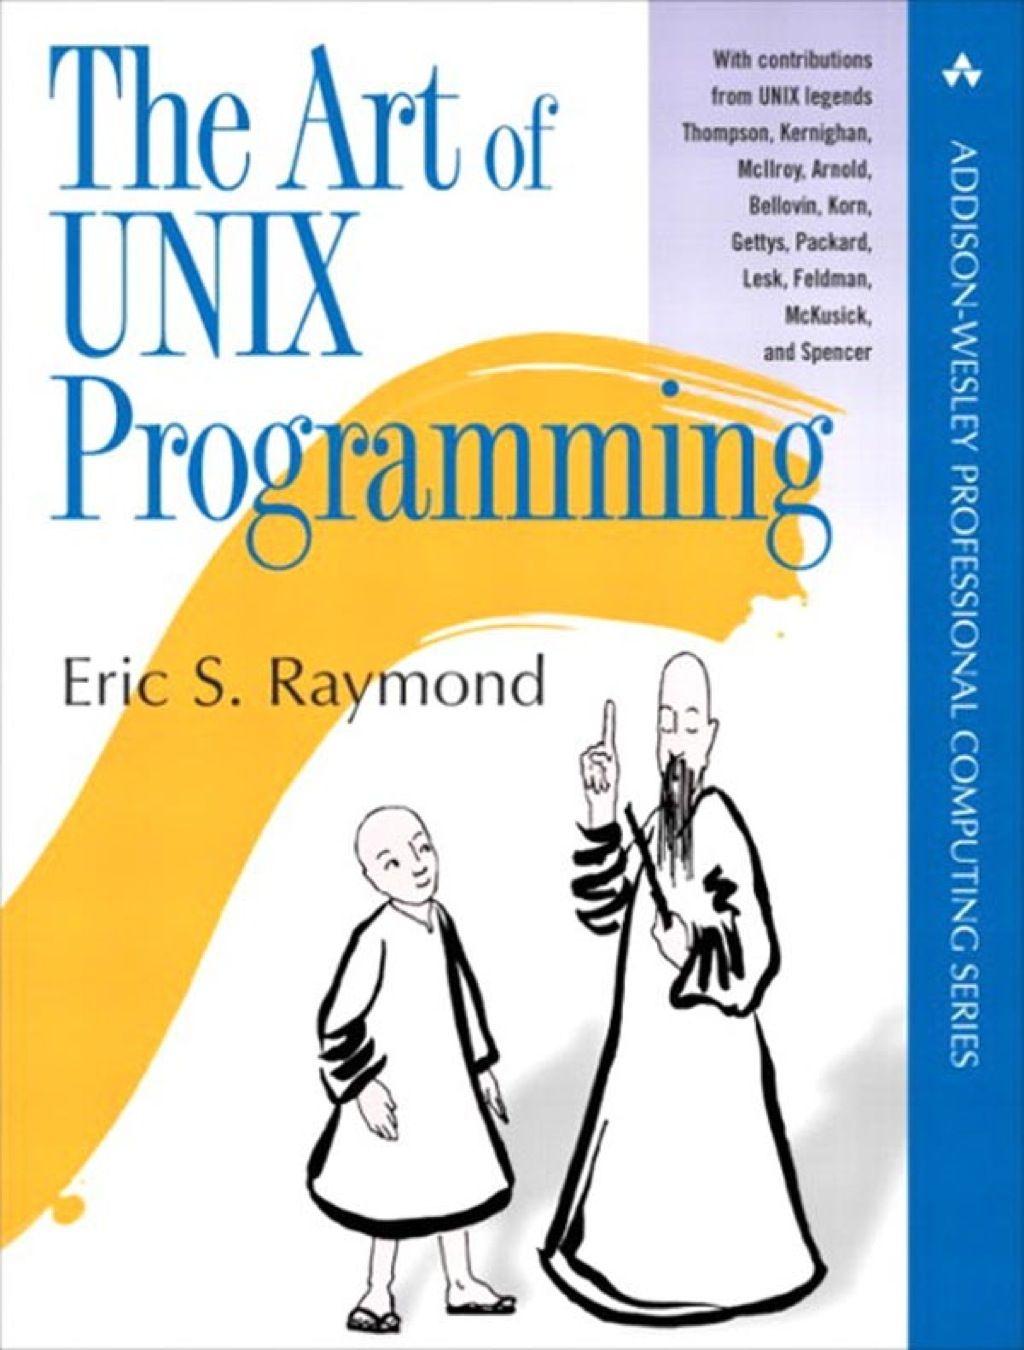 The Art of UNIX Programming (eBook) Unix programming